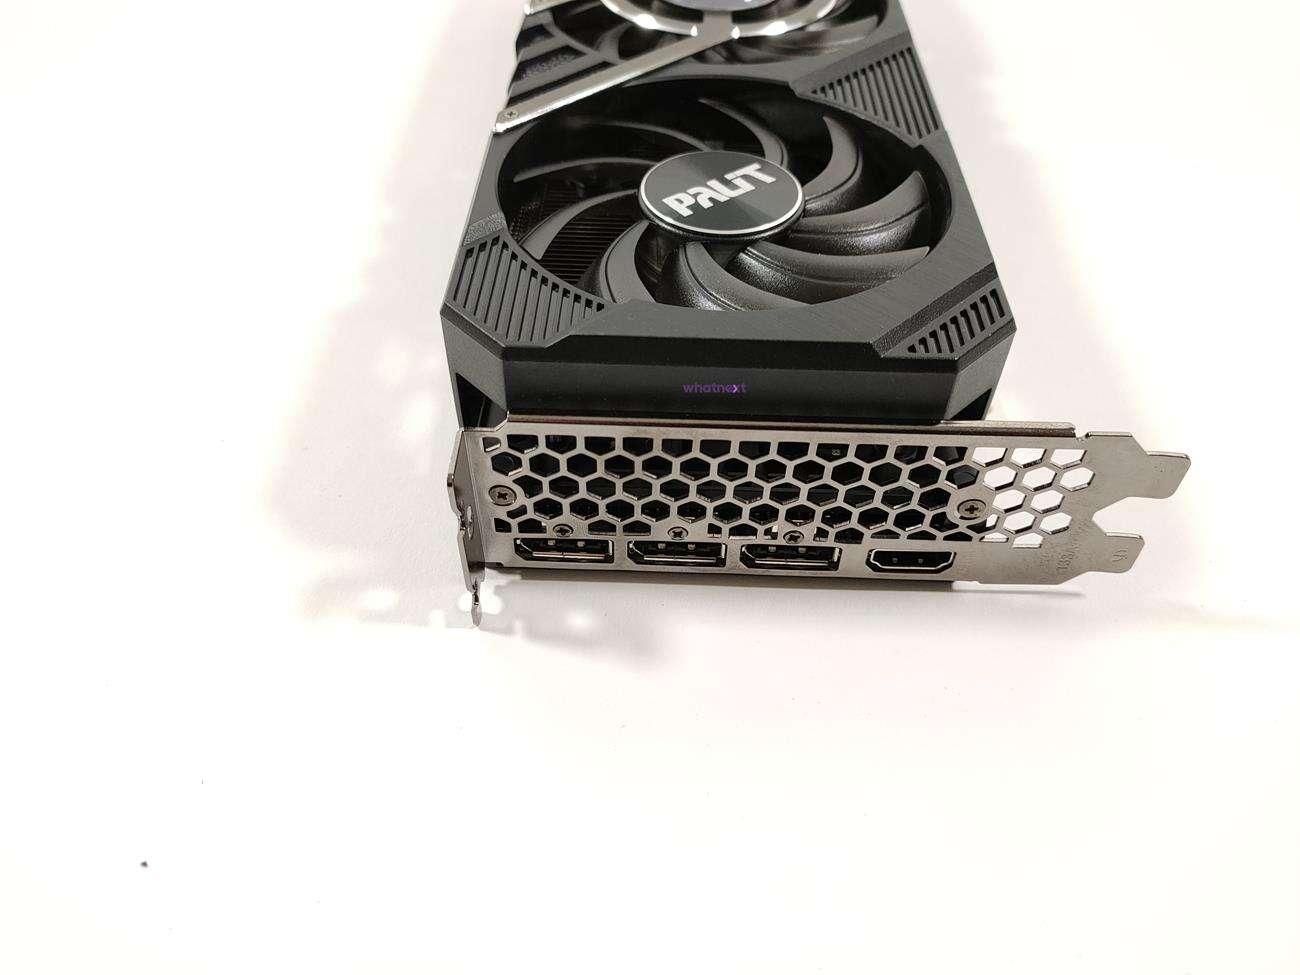 test Palit GeForce RTX 3060 Ti GamingPro OC, recenzja Palit GeForce RTX 3060 Ti GamingPro OC, review Palit GeForce RTX 3060 Ti GamingPro OC, opinia Palit GeForce RTX 3060 Ti GamingPro OC